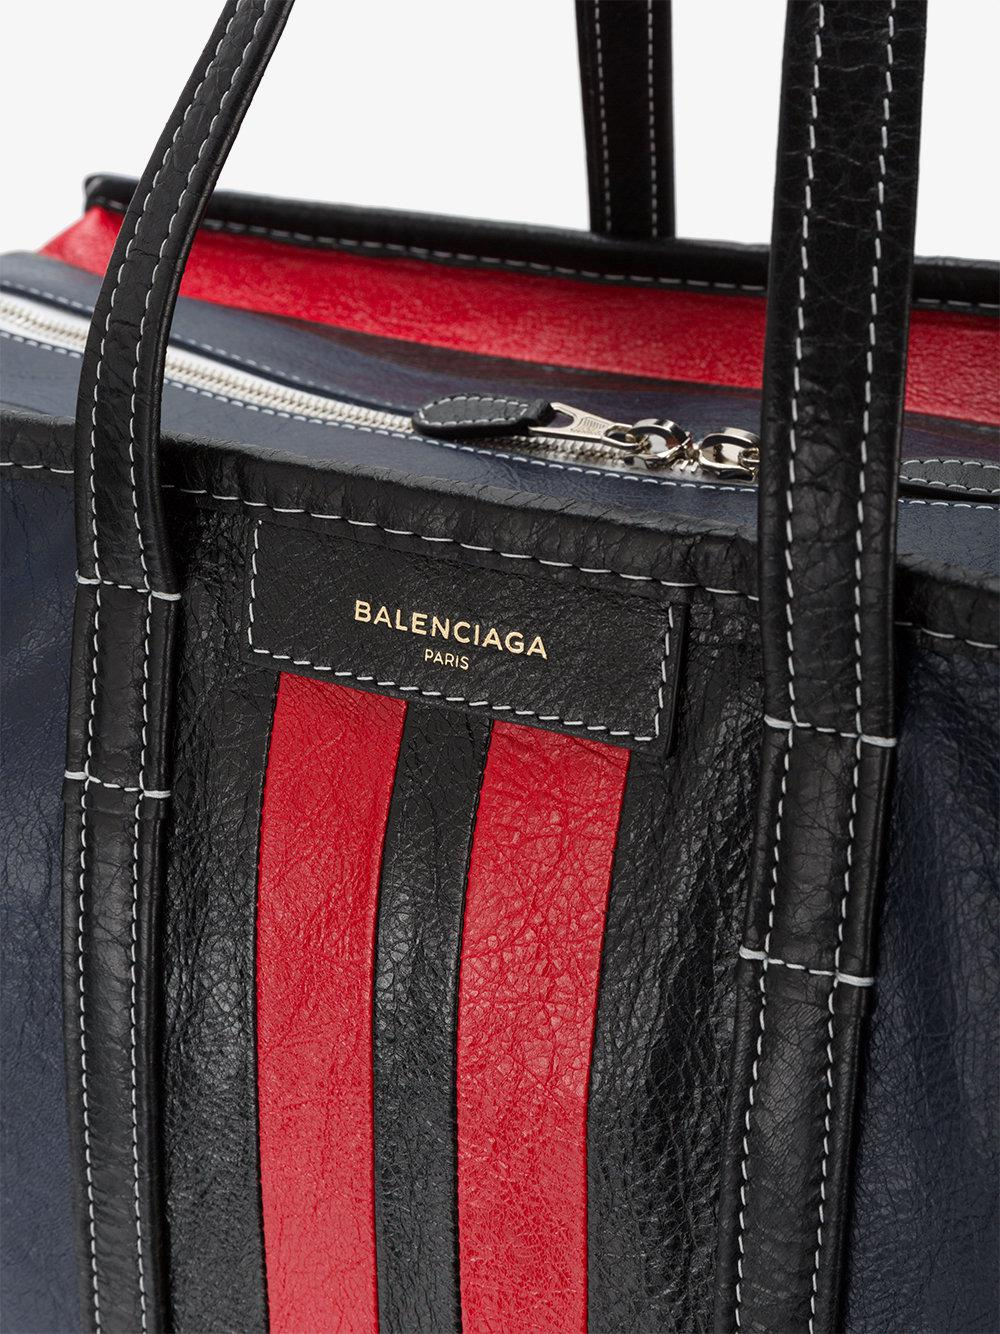 bbf7208bc Balenciaga Bazar Striped Shopper Bag in Black for Men - Lyst